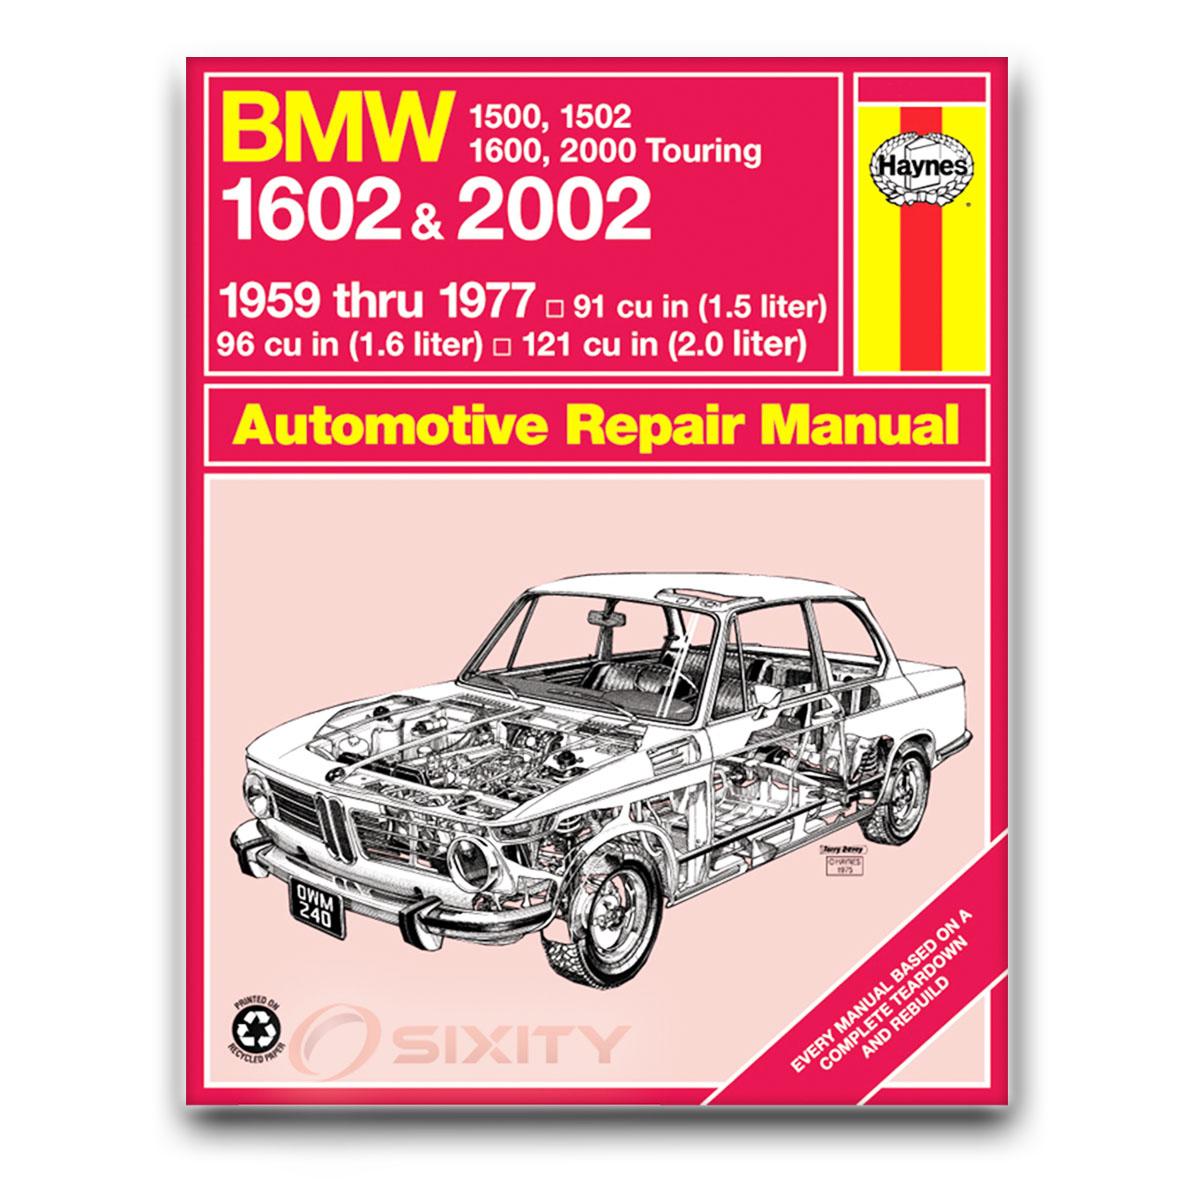 Haynes Repair Manual for BMW 2002 Cabriolet Base Turbo Shop Service Garage  sy